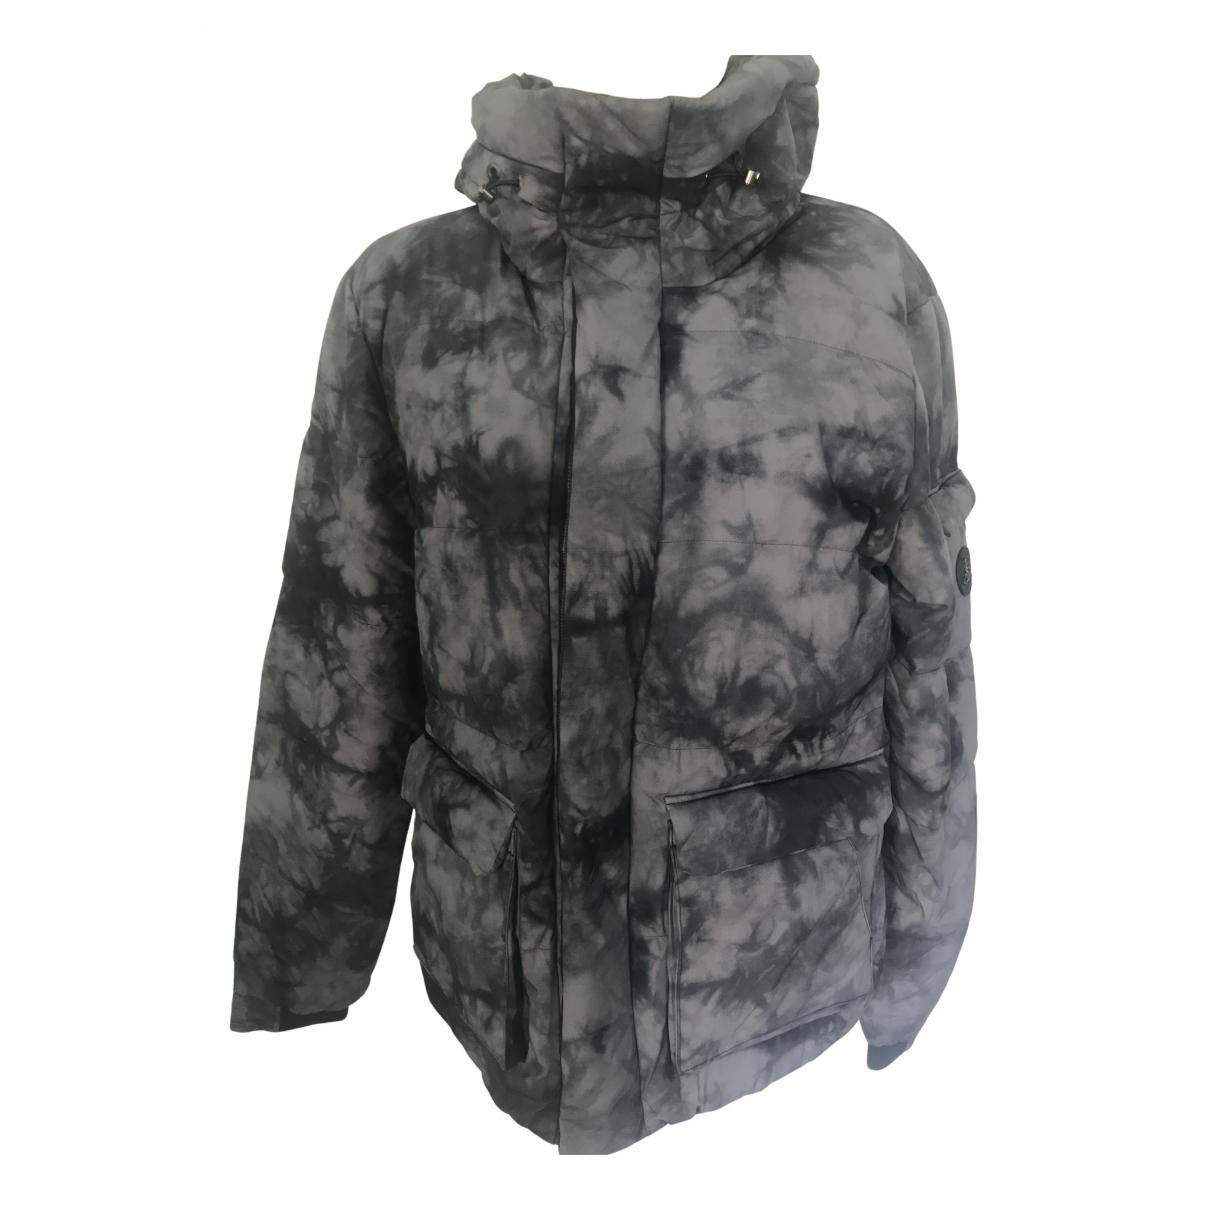 Jott \N Blue jacket  for Men L International